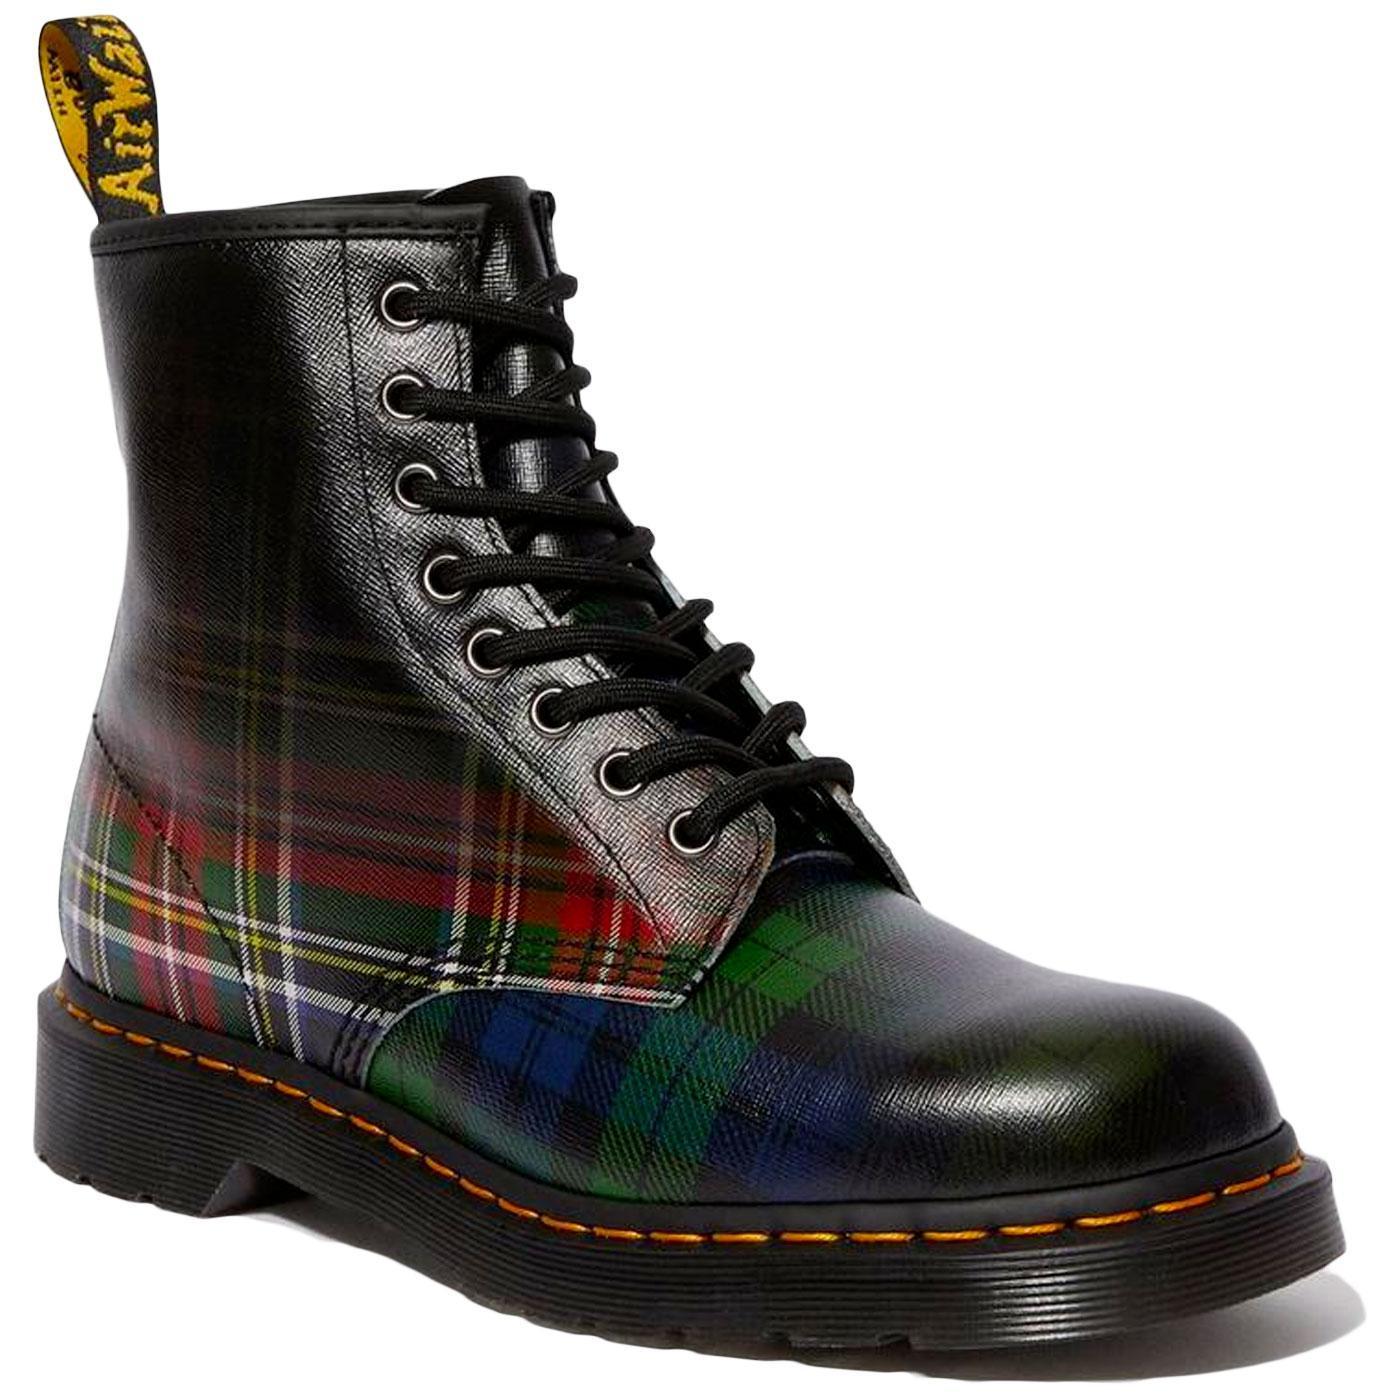 1460 Tartan DR MARTENS Retro Mod Check Ankle Boots